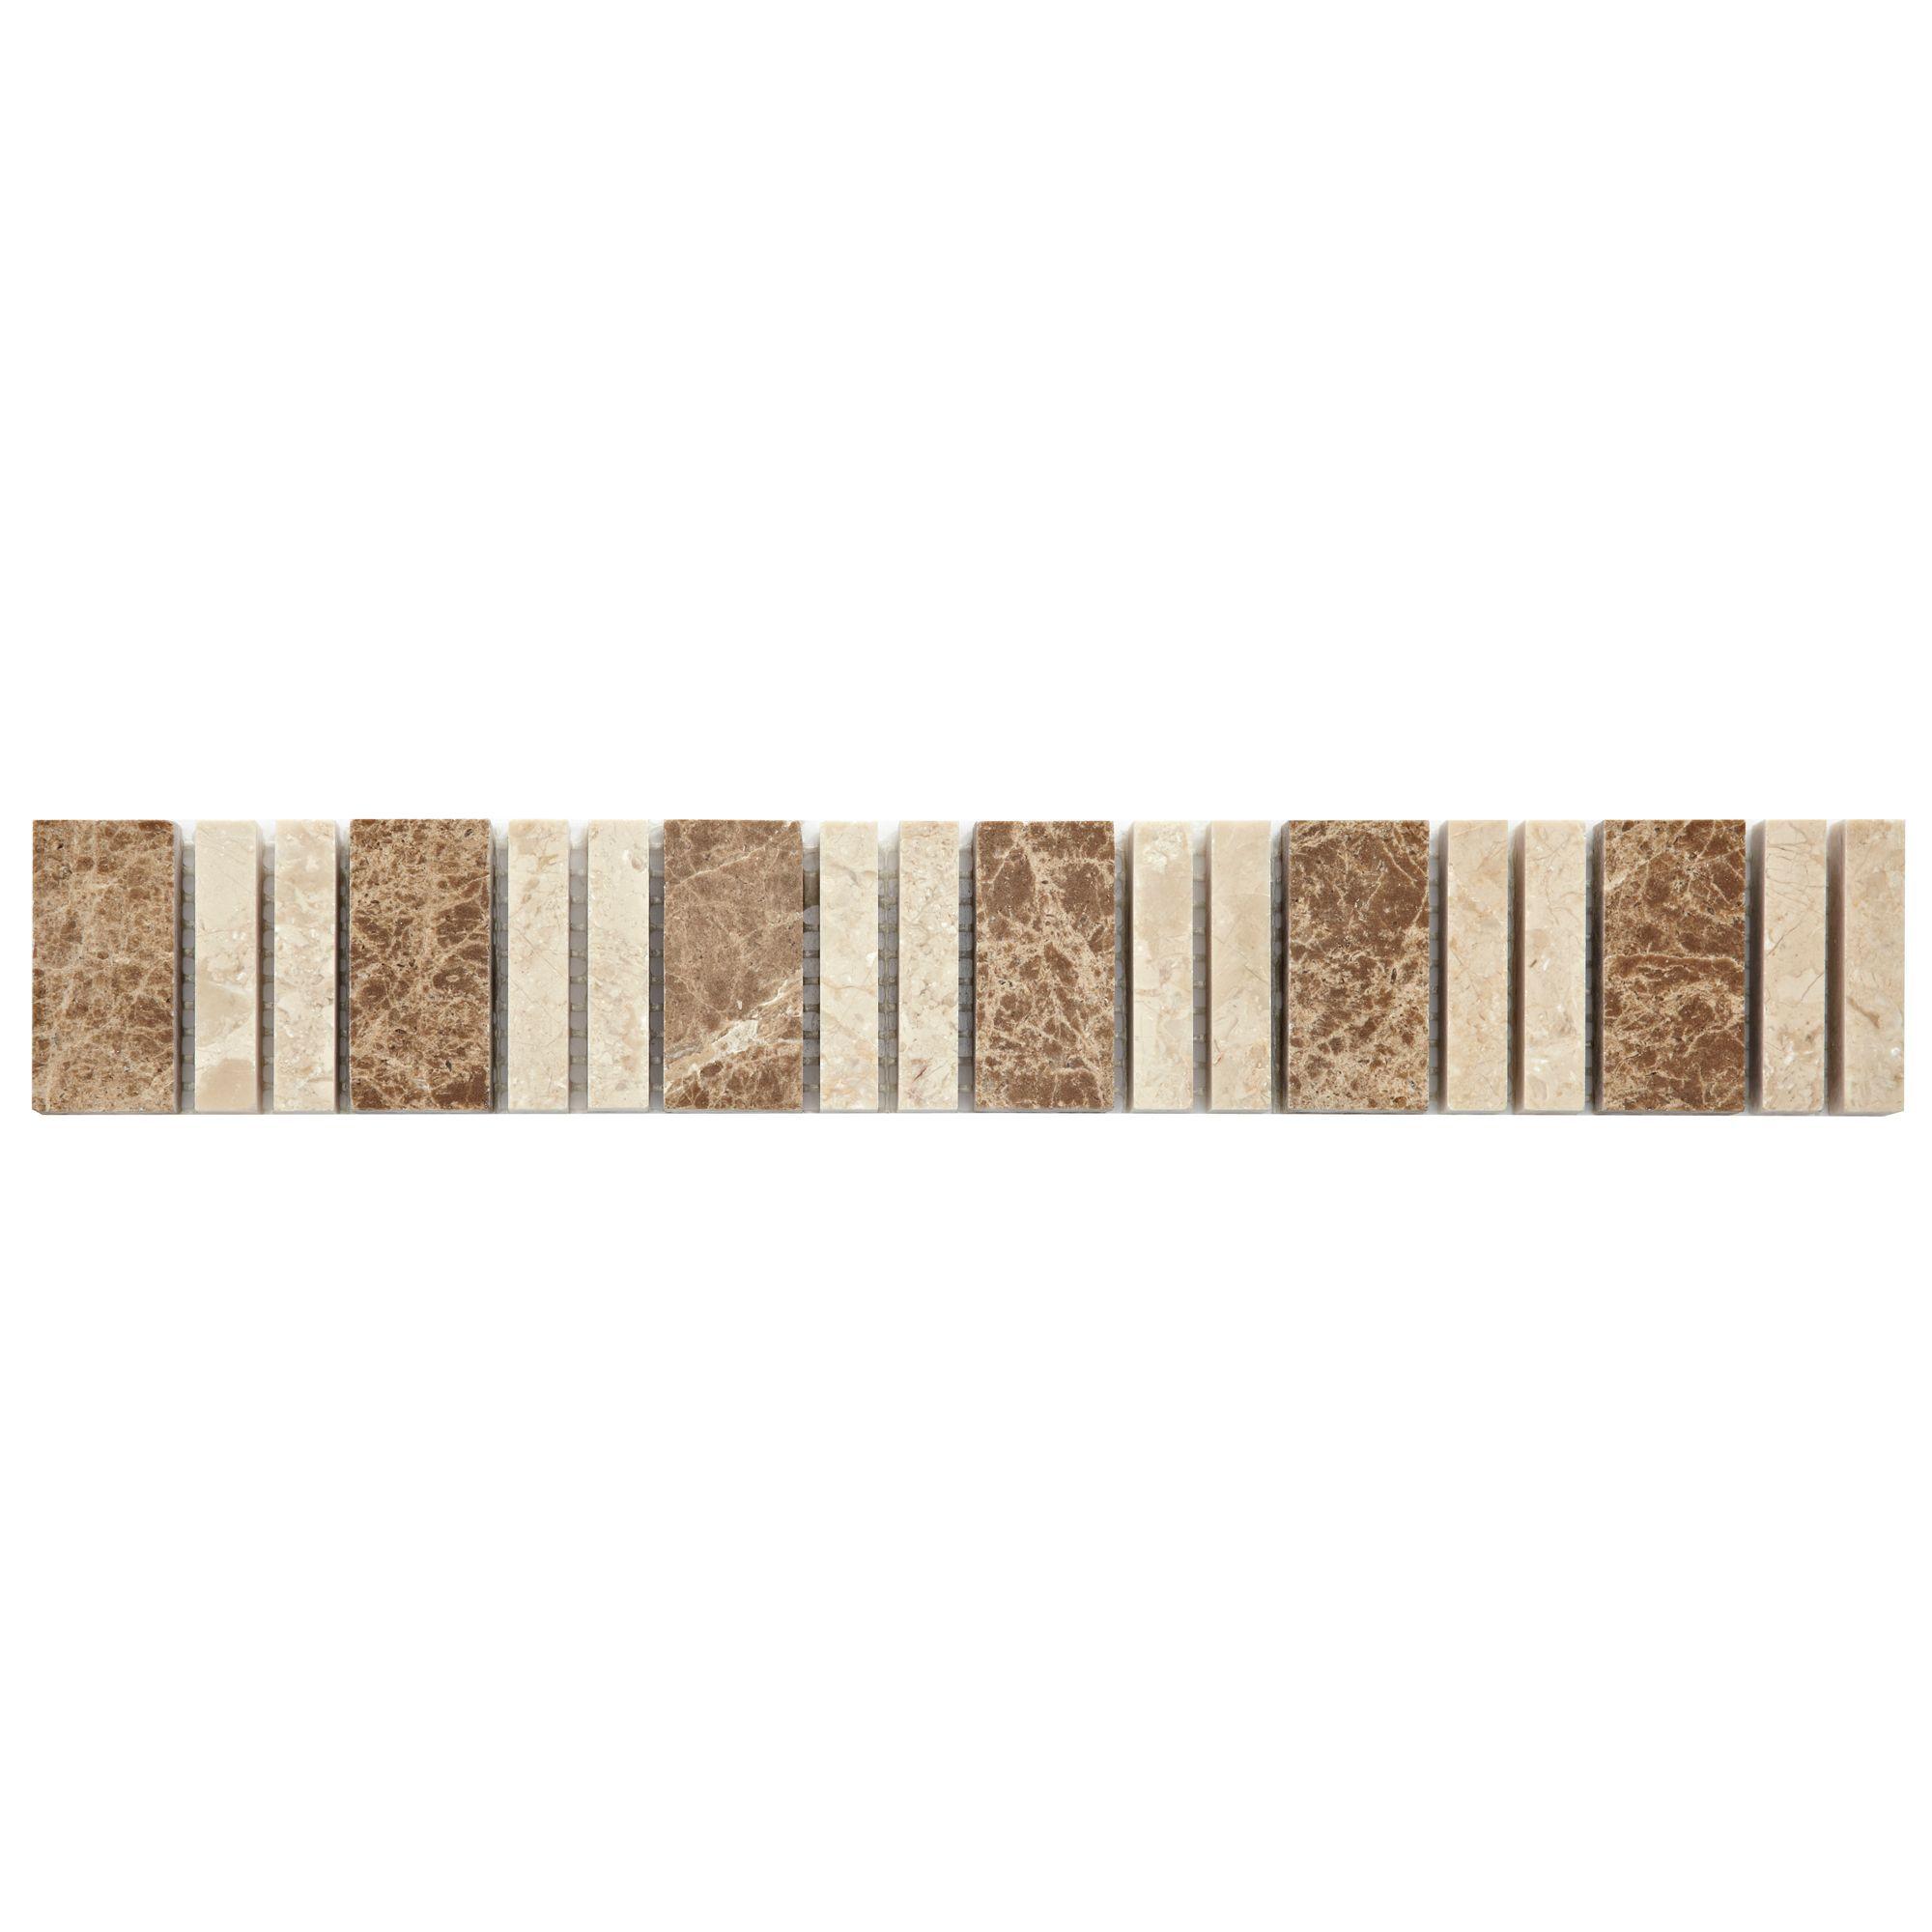 almond beige stone effect mosaic ceramic border tile l. Black Bedroom Furniture Sets. Home Design Ideas